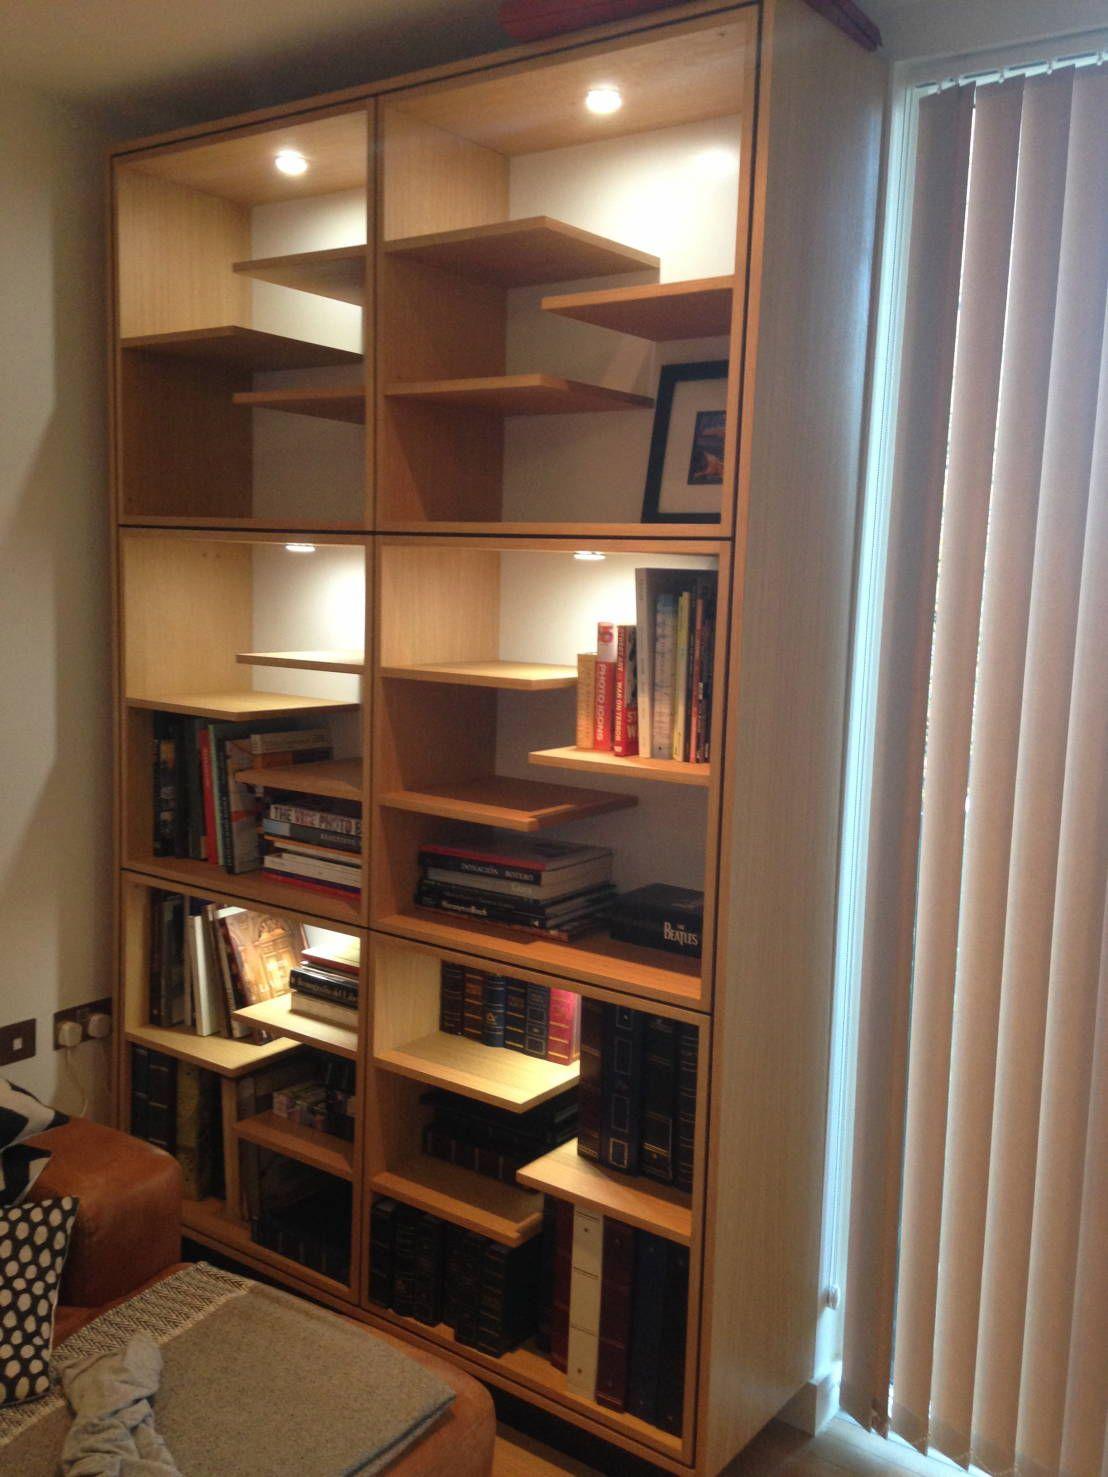 Great Ideas For Indirect Lighting Bookshelf Lighting Bookcase Eclectic Decor Modern